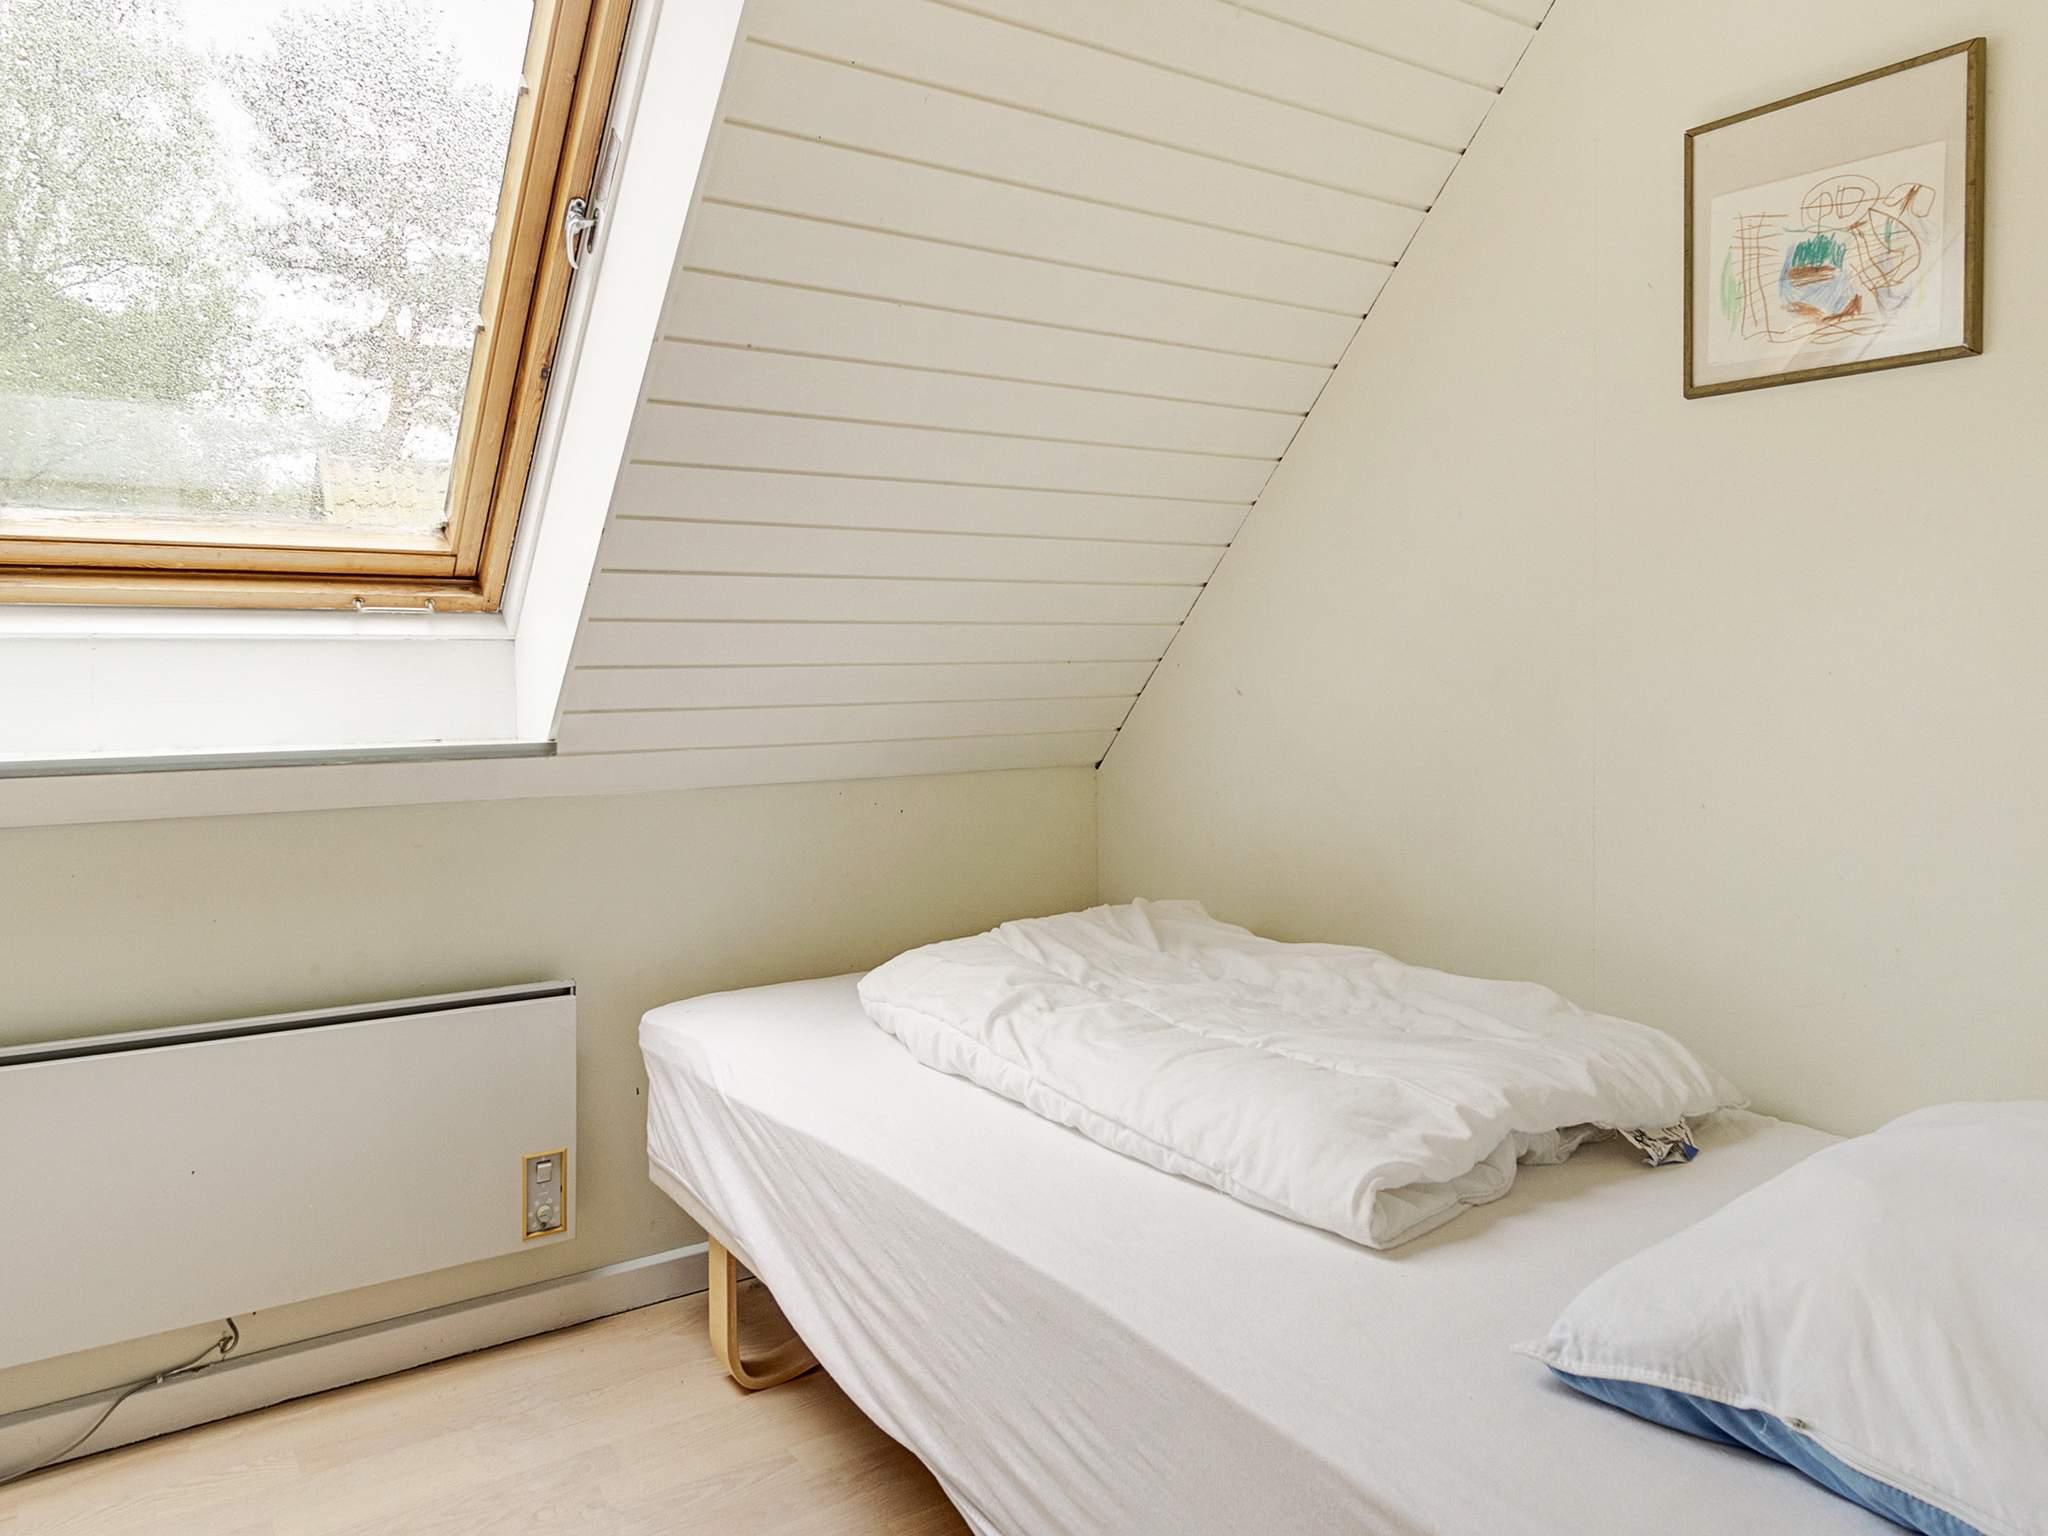 Ferienhaus Balka Strand (660138), Balke, , Bornholm, Dänemark, Bild 7